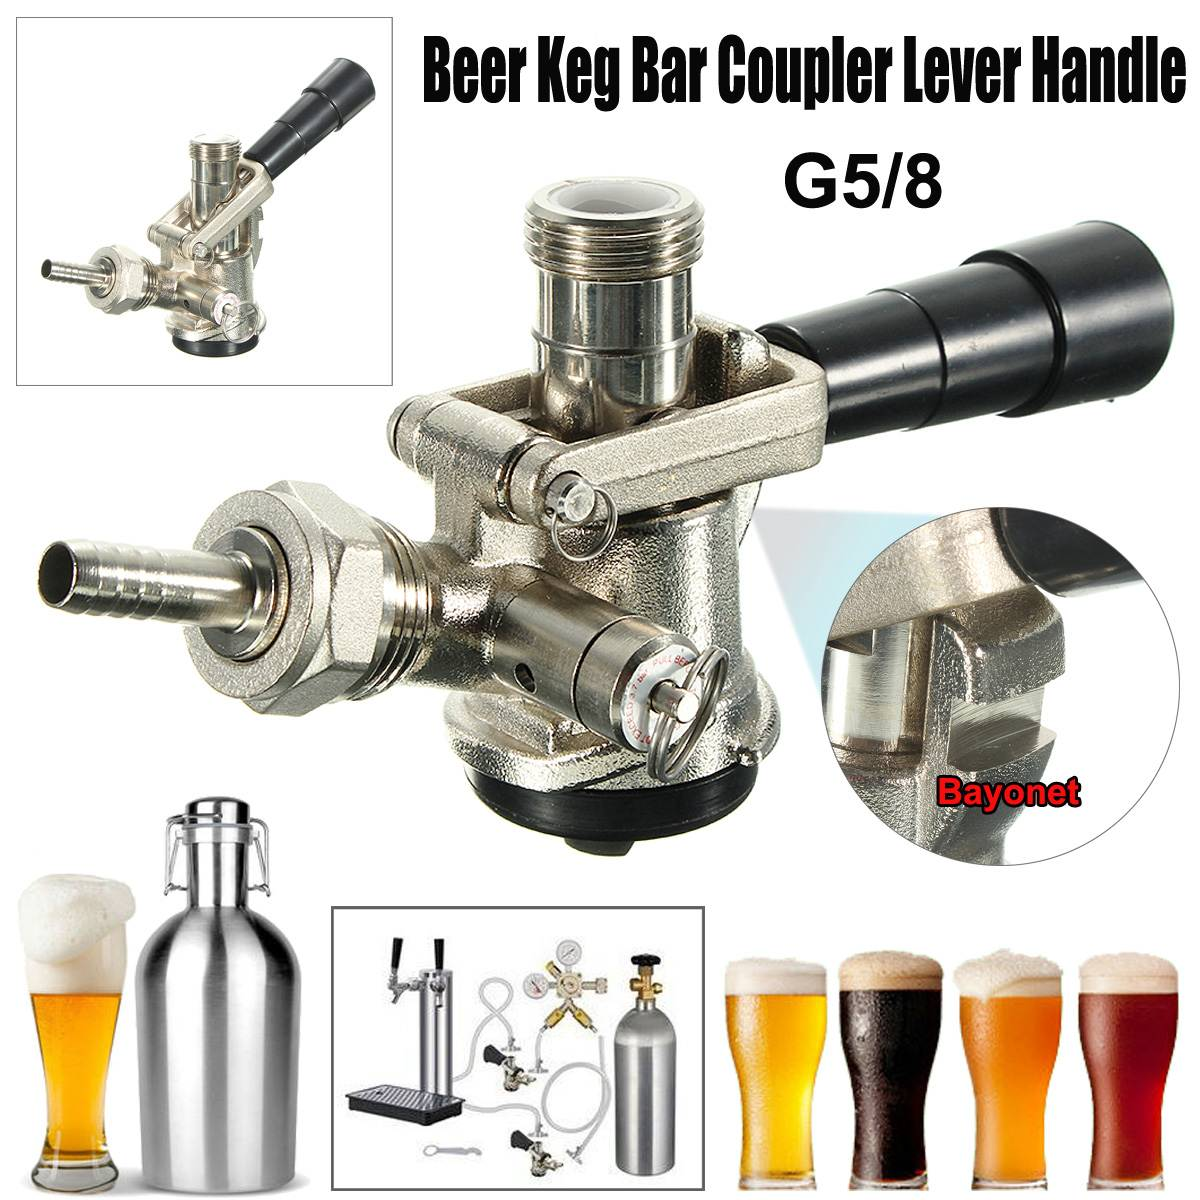 NEW D/S Type Beer Keg Coupler Draft Beer Dispenser For Home Brew Connectors Coupler Head For Home Brew Wine Beer Dispenser